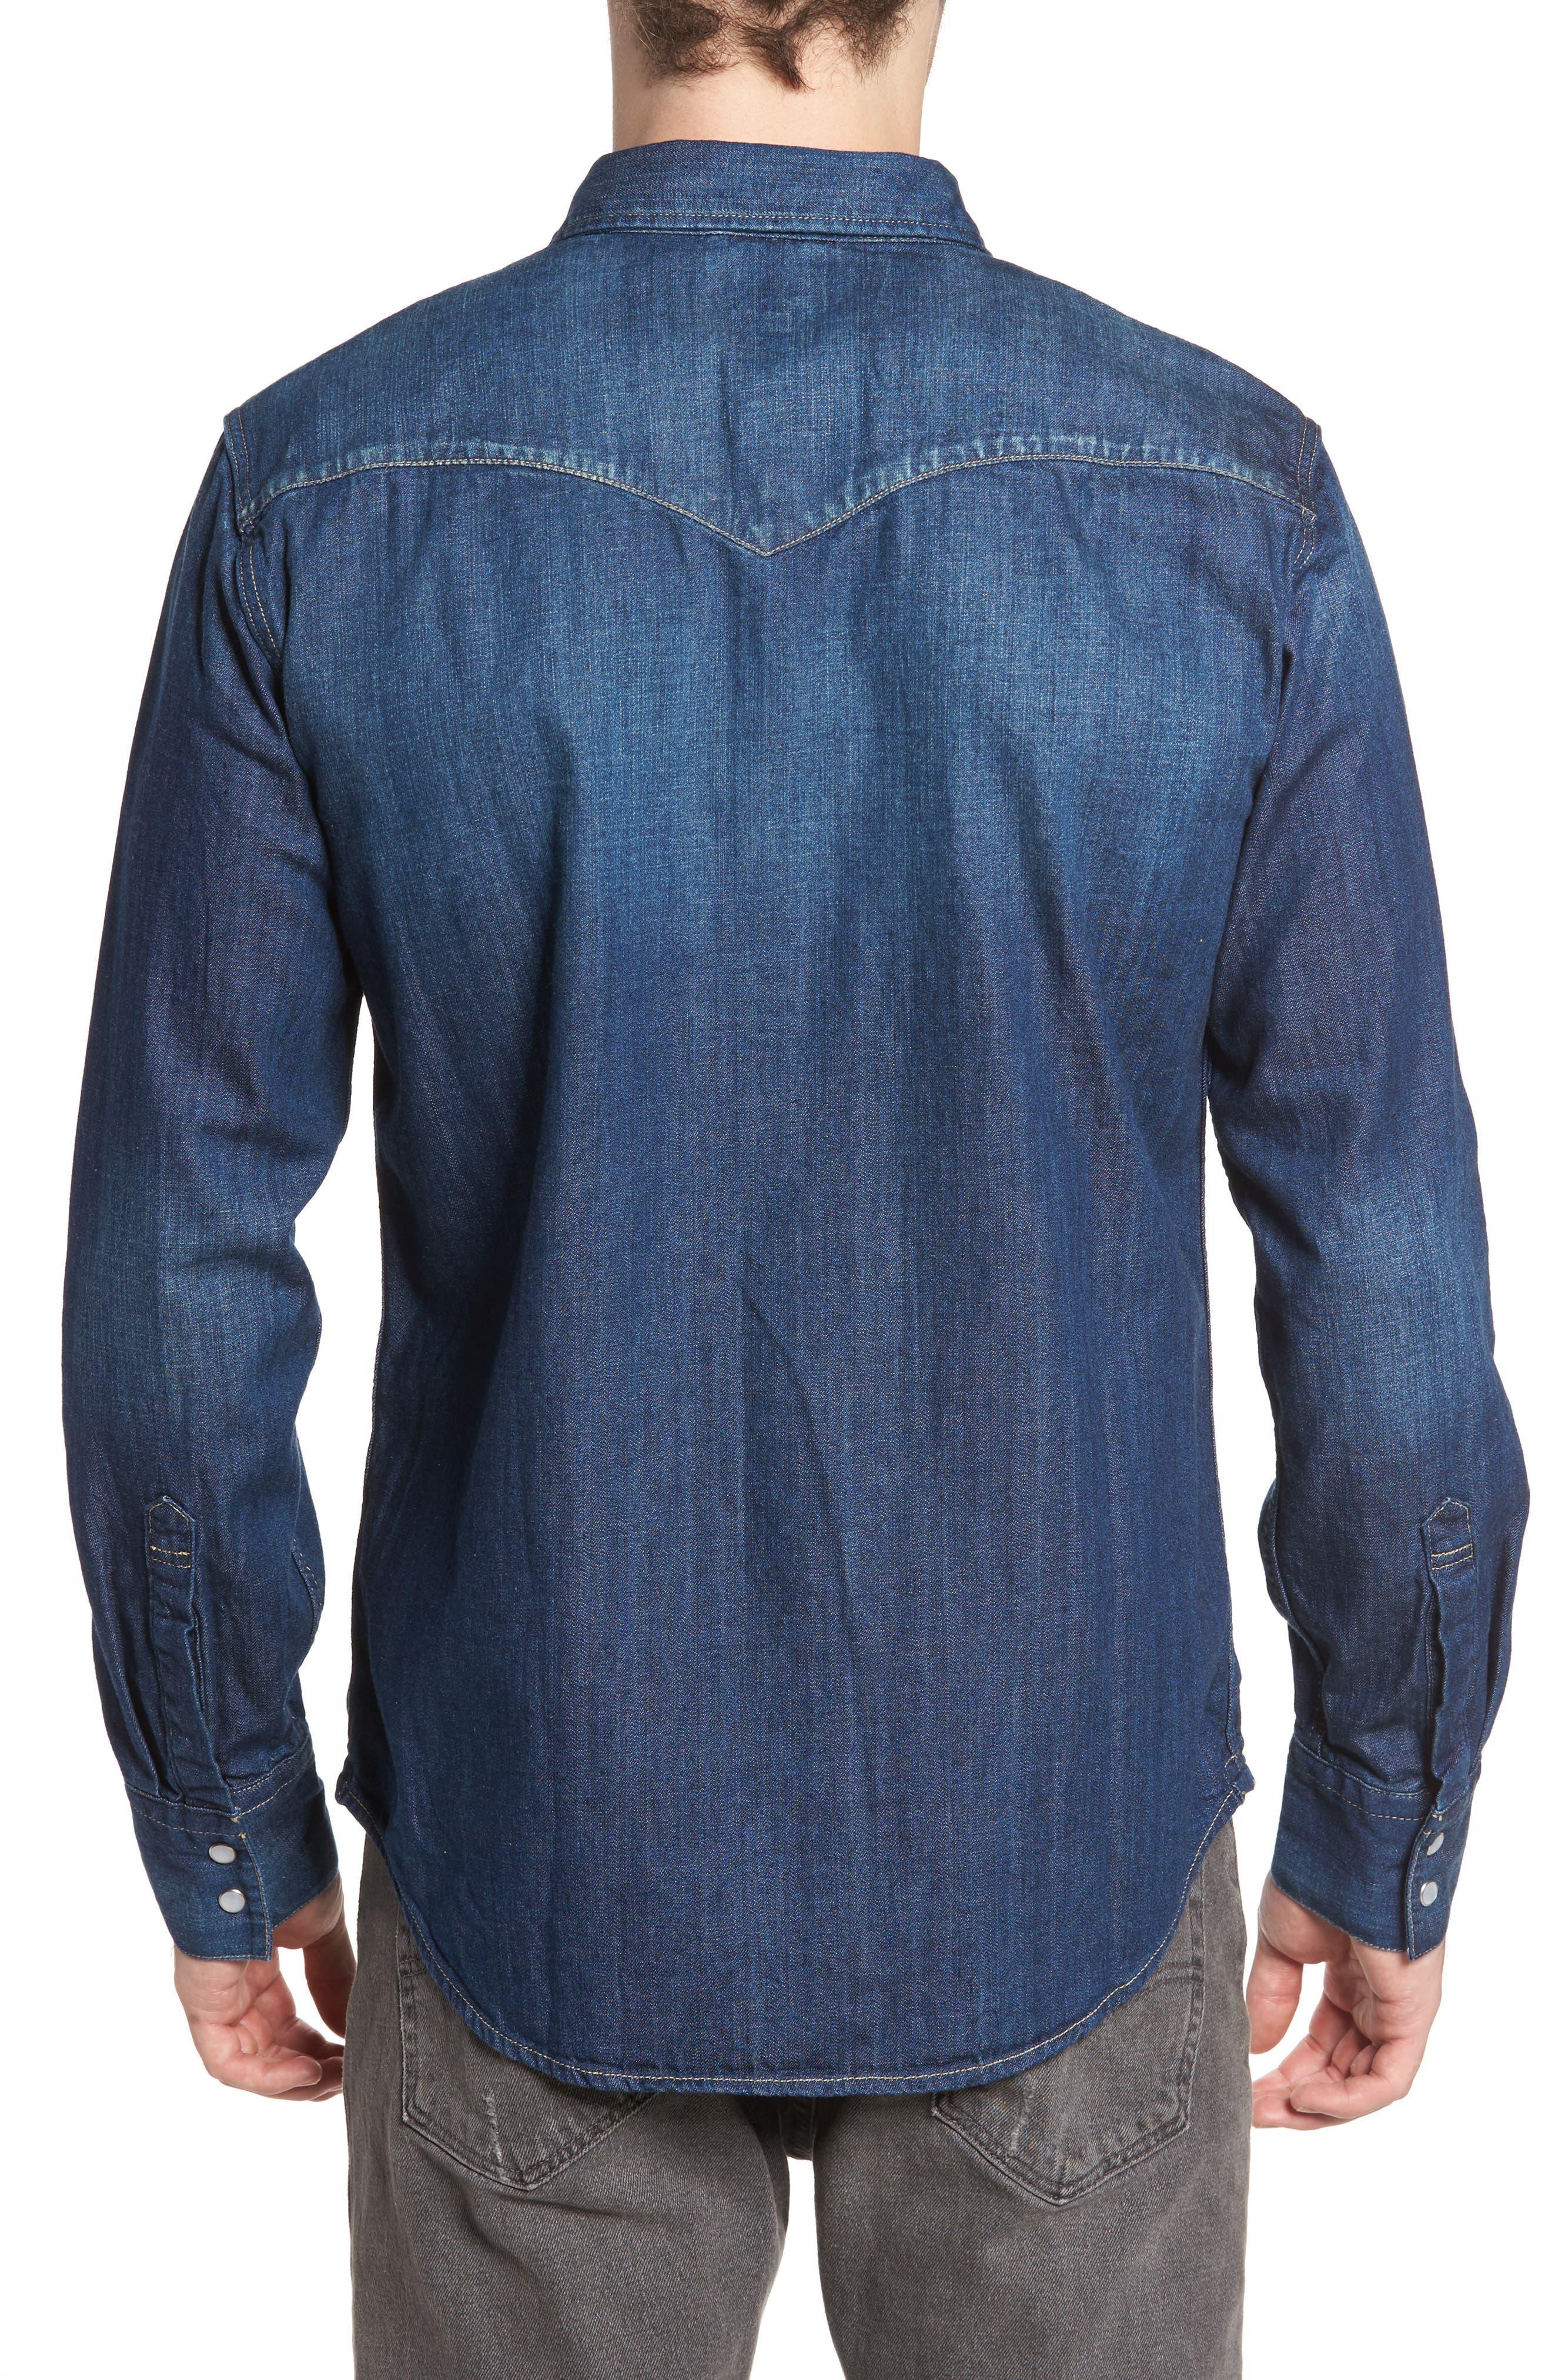 'Barstow' Denim Western Shirt,                             Alternate thumbnail 8, color,